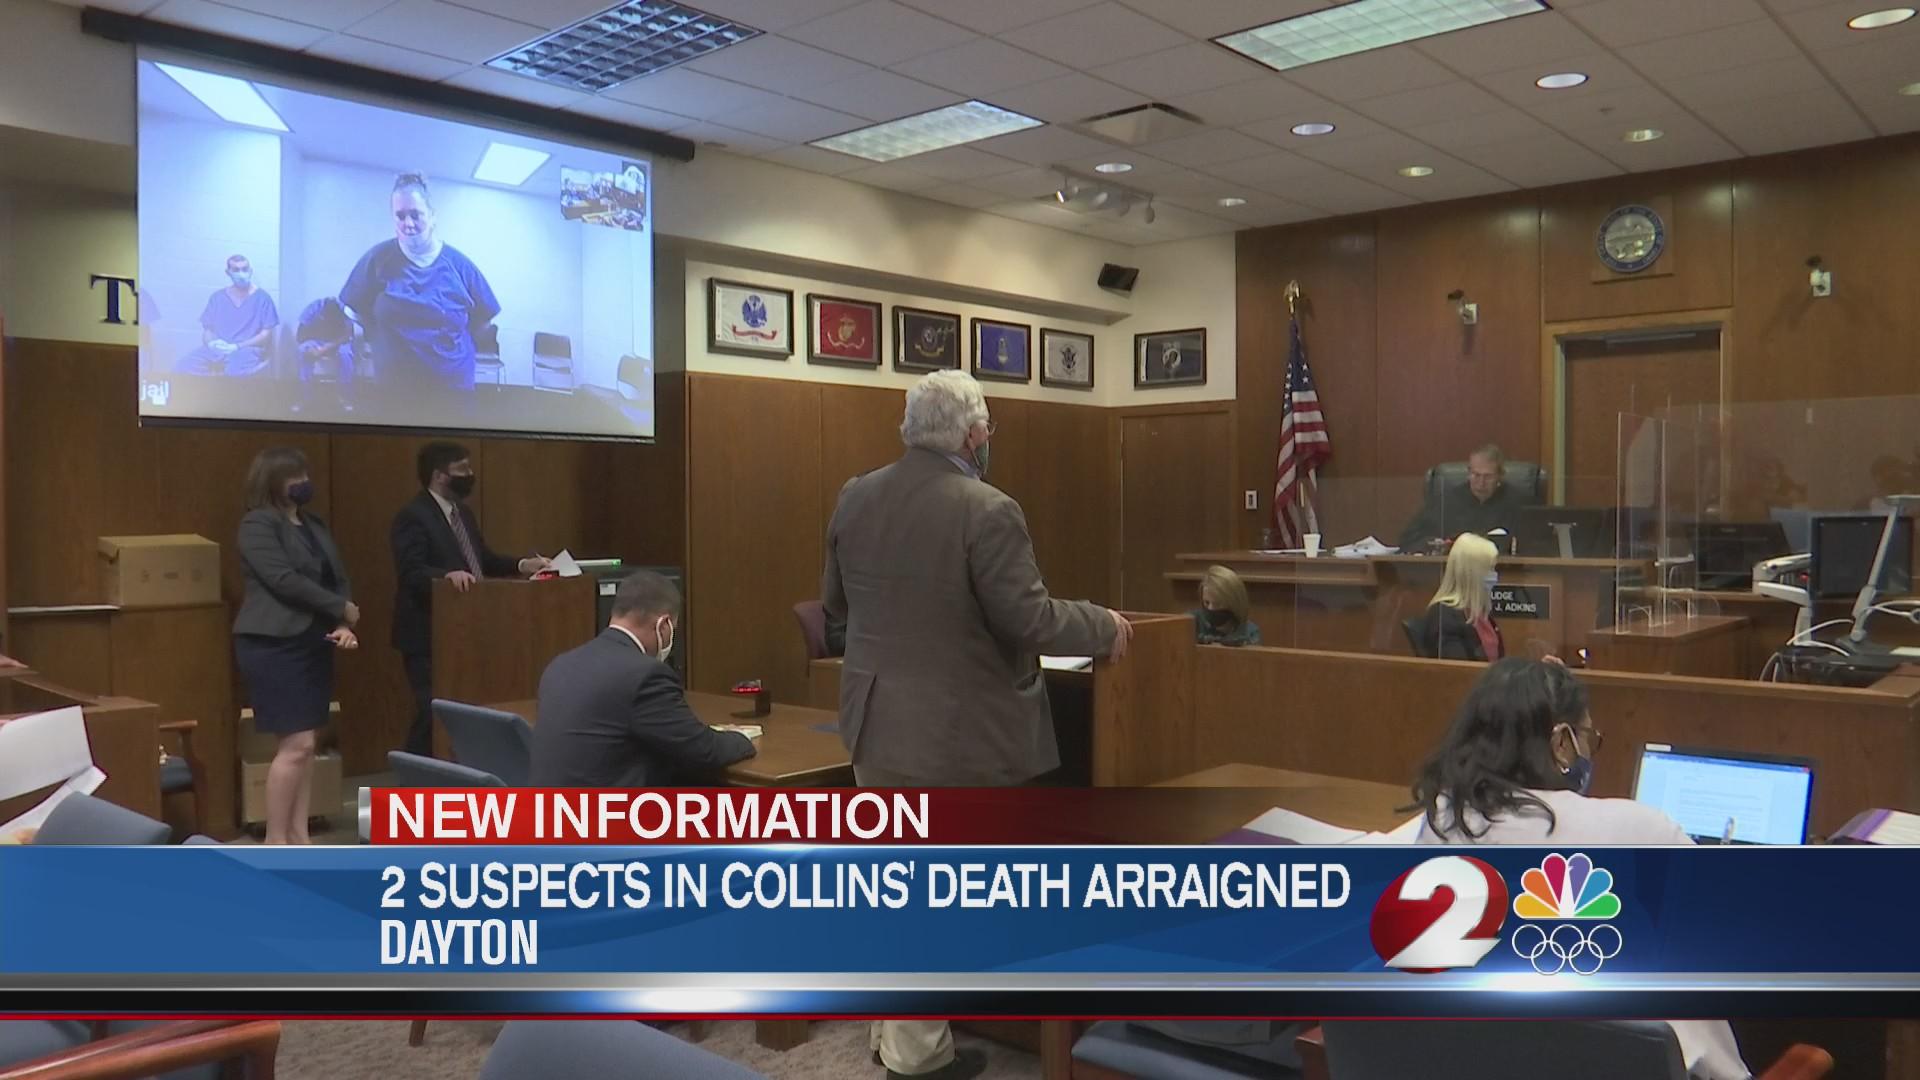 2 suspects Collins death arraigned